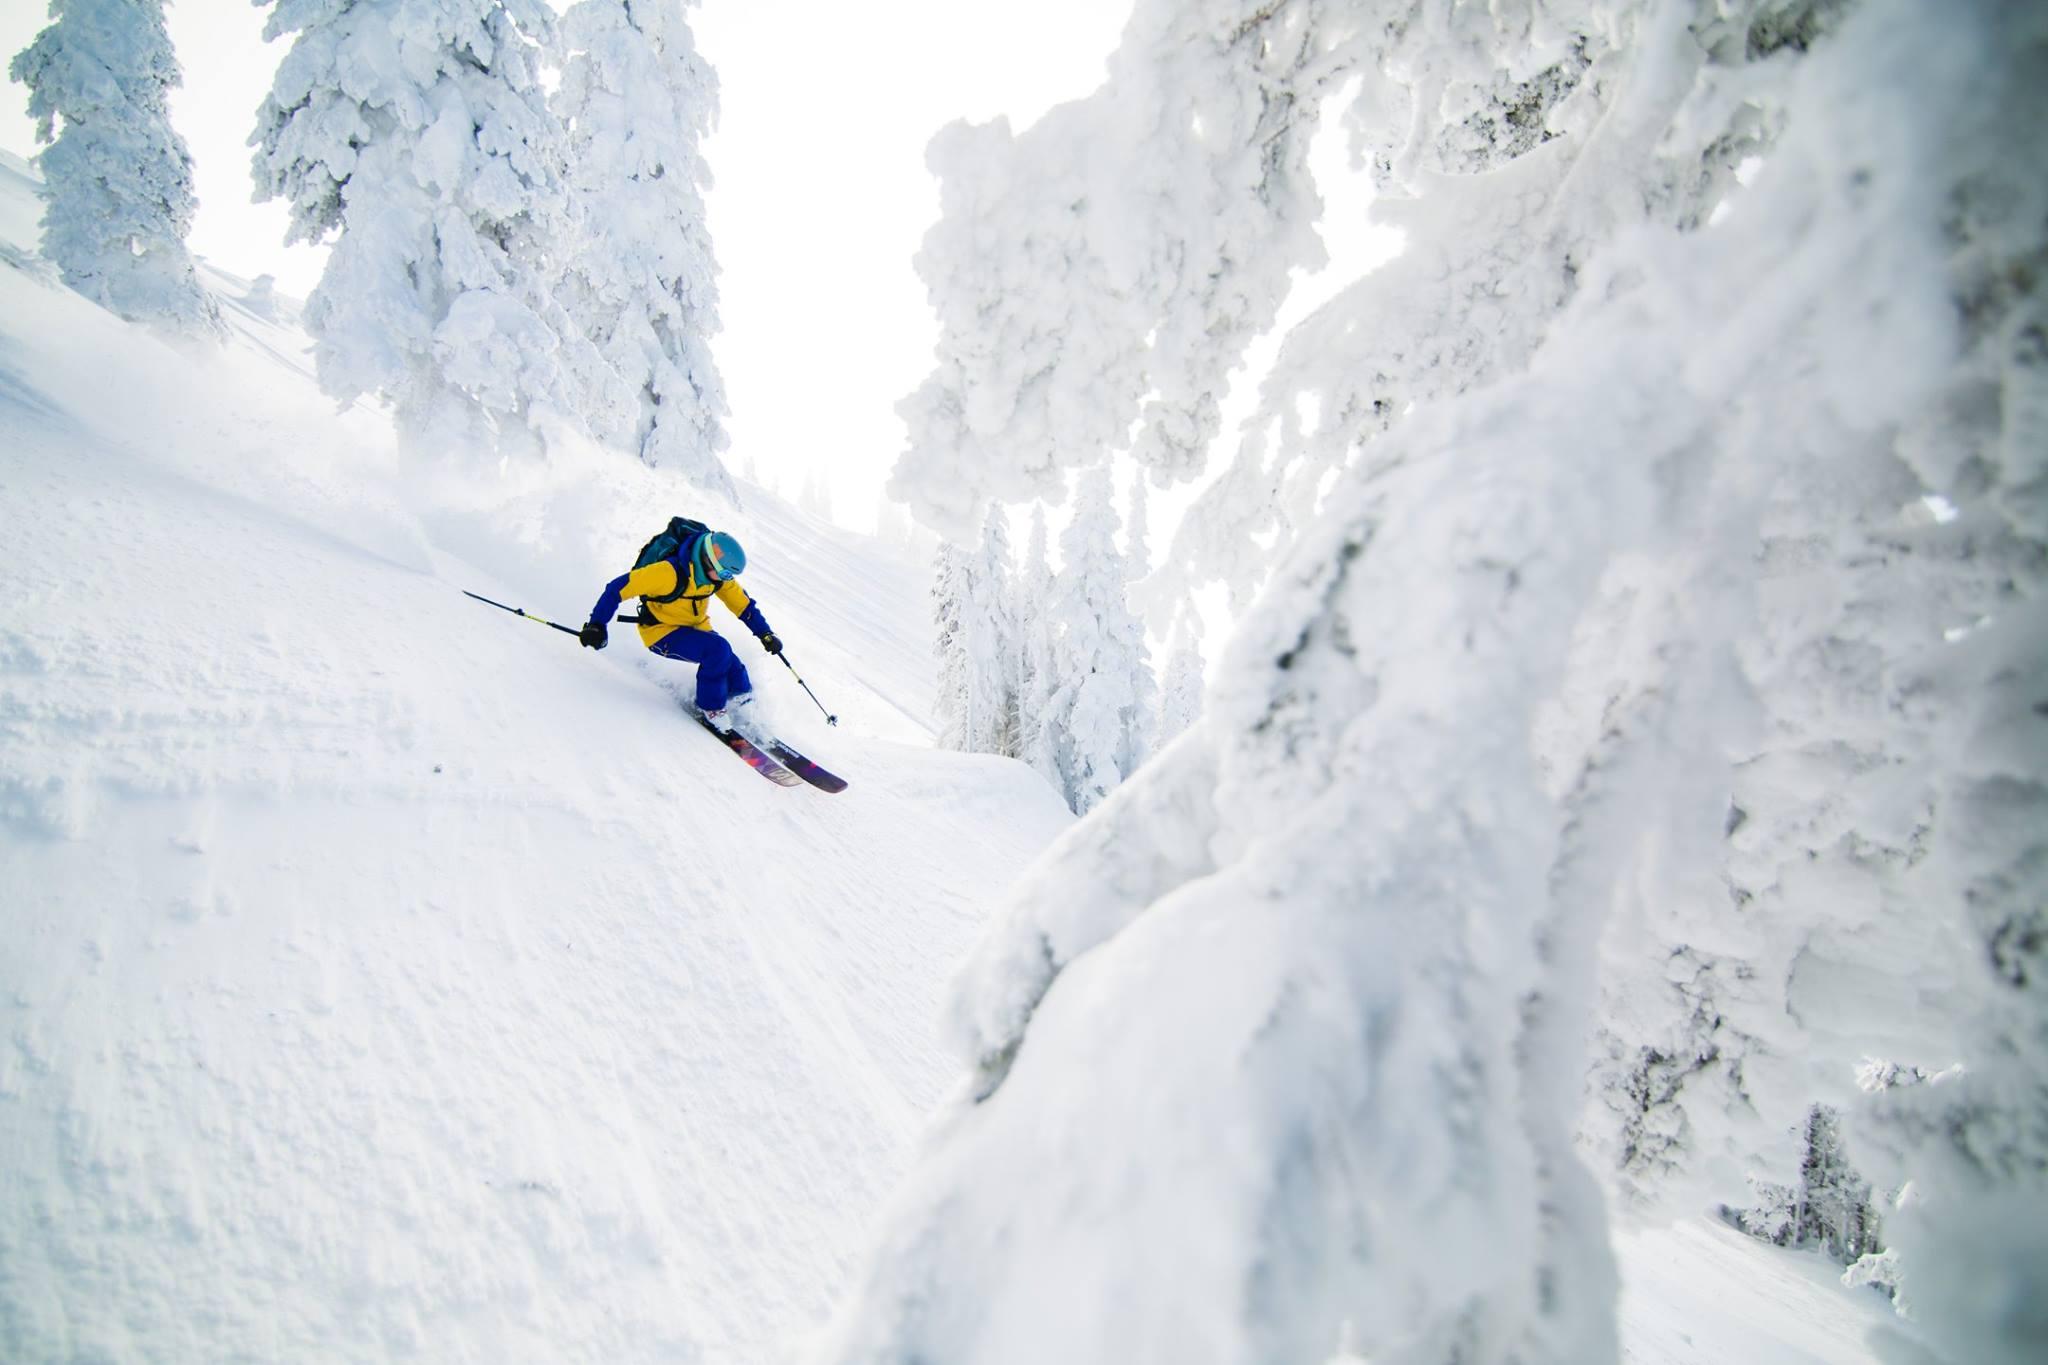 Skier Leah Evans in Revelstoke (Zoya Lynch/Revelstoke Mountain Resort/Facebook)